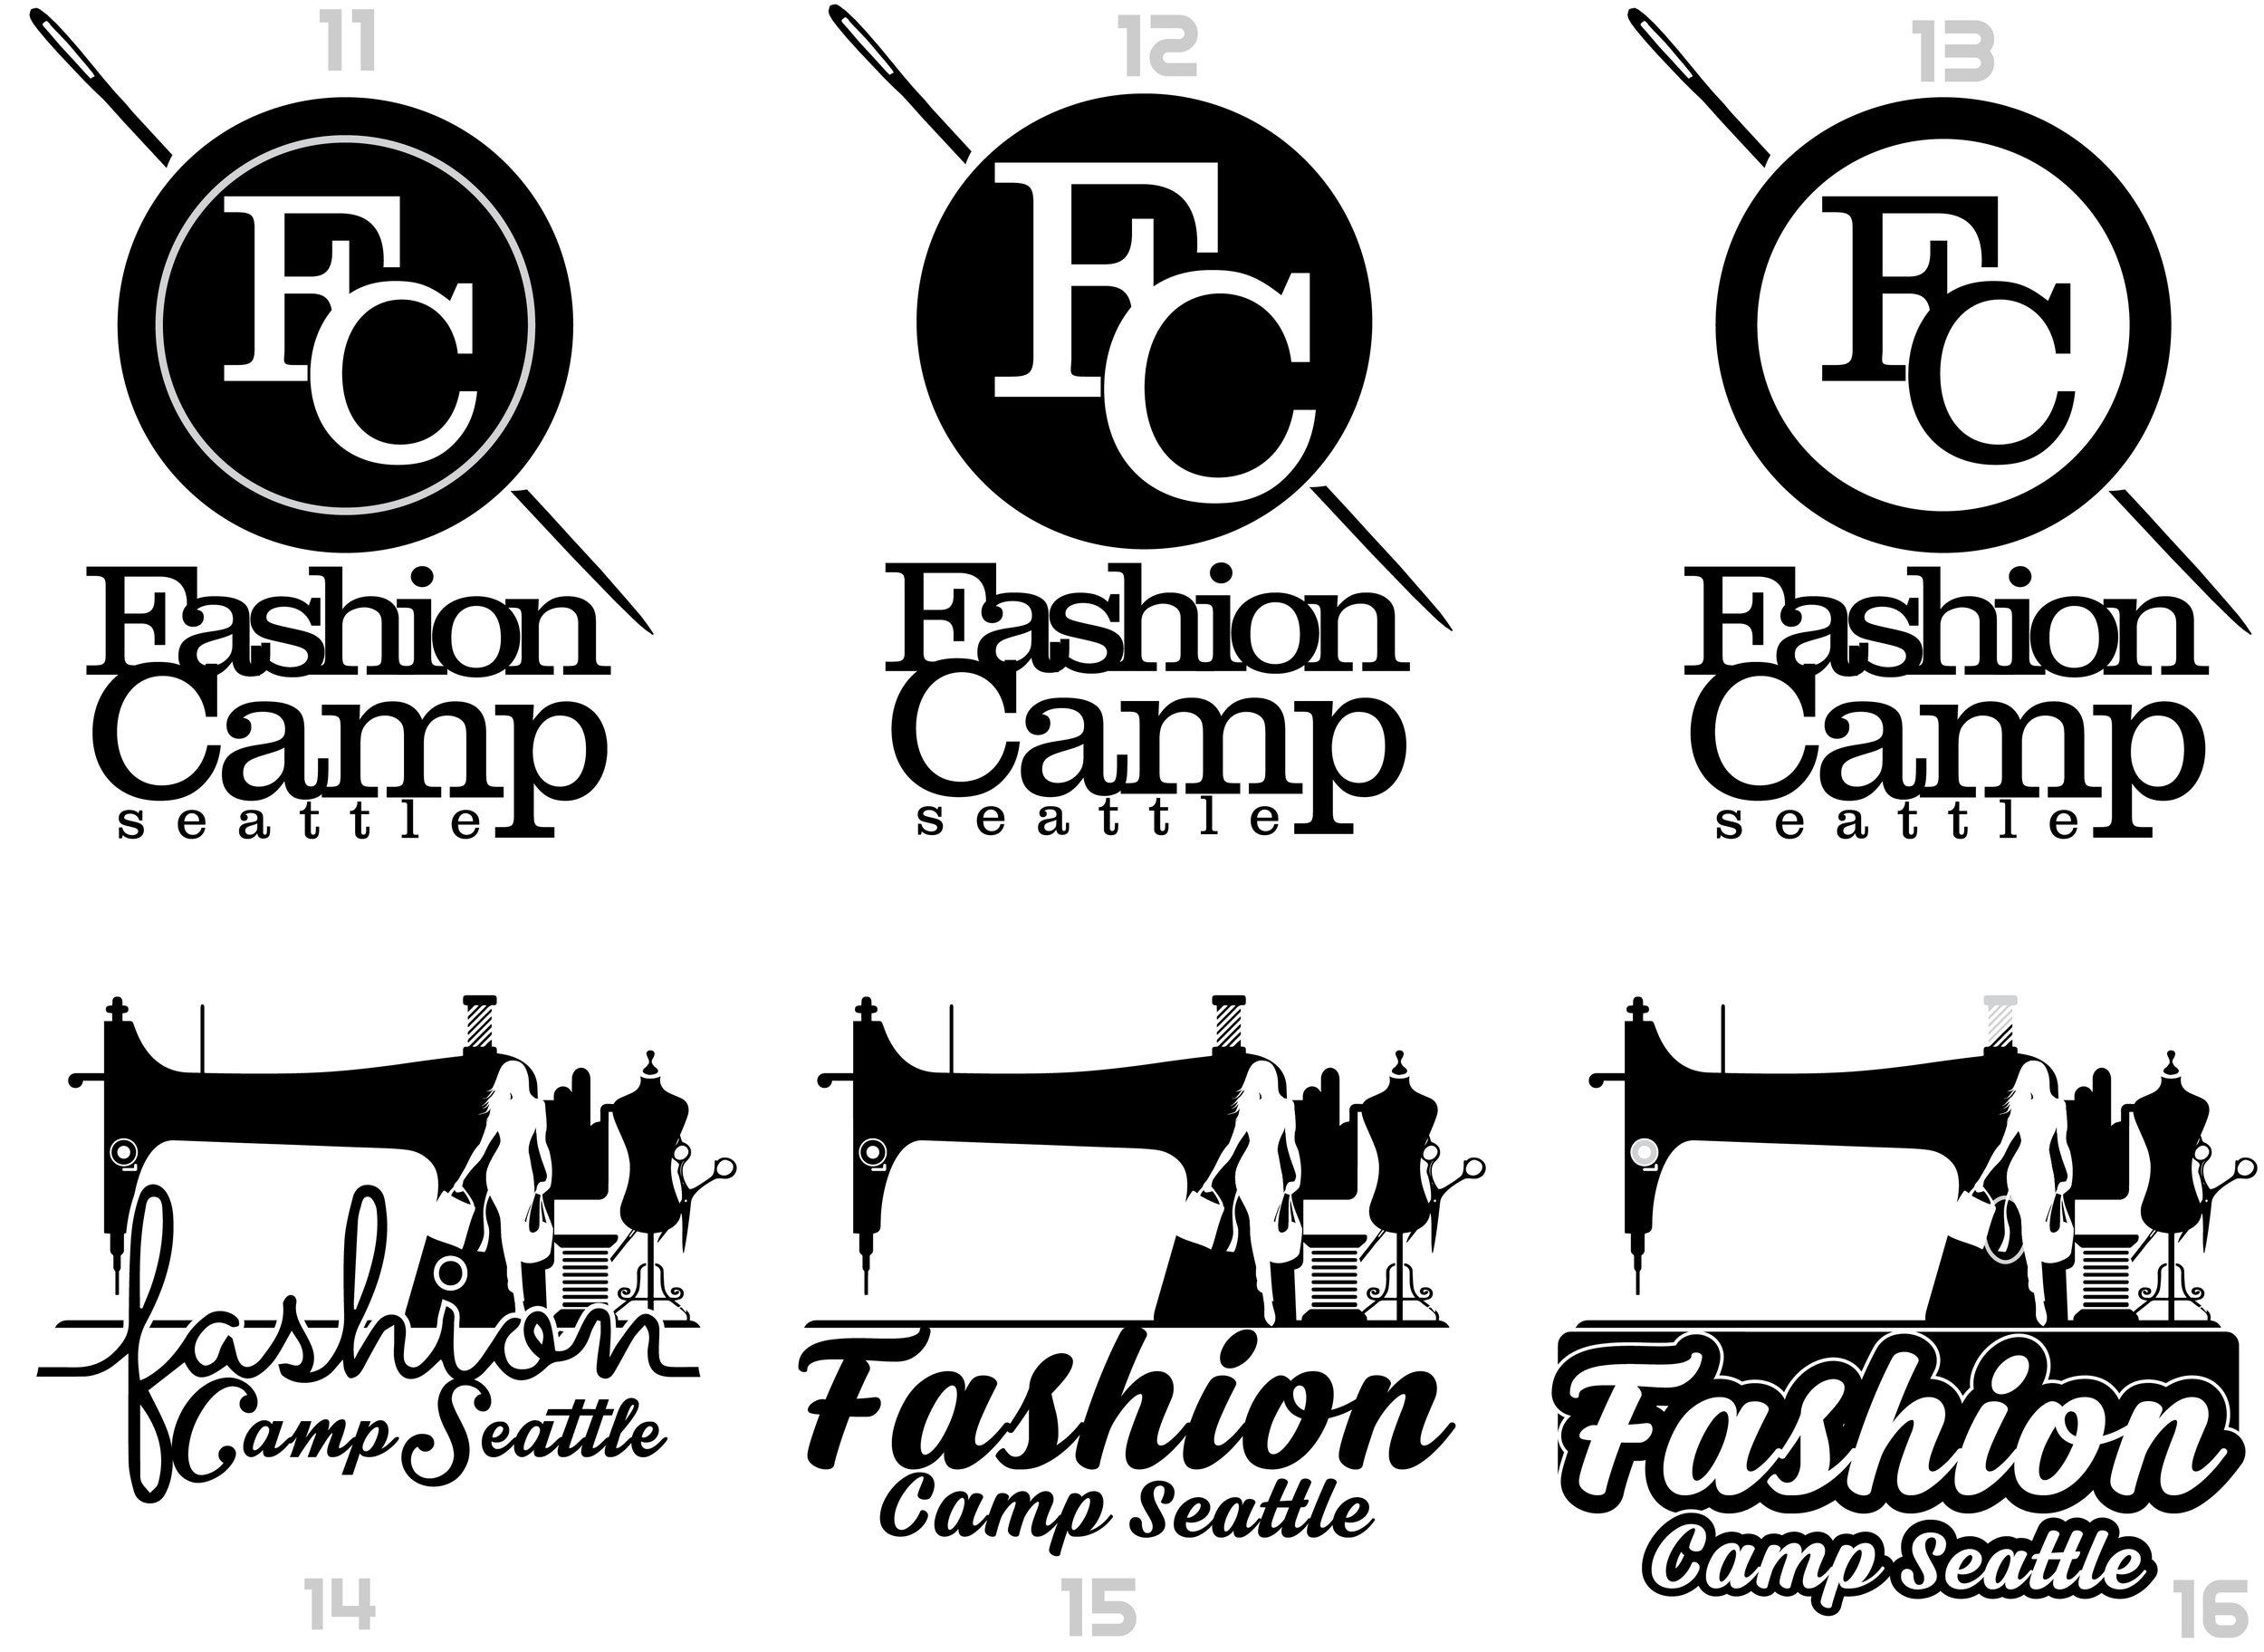 FASHION CAMP SEATTLE2-01.jpg